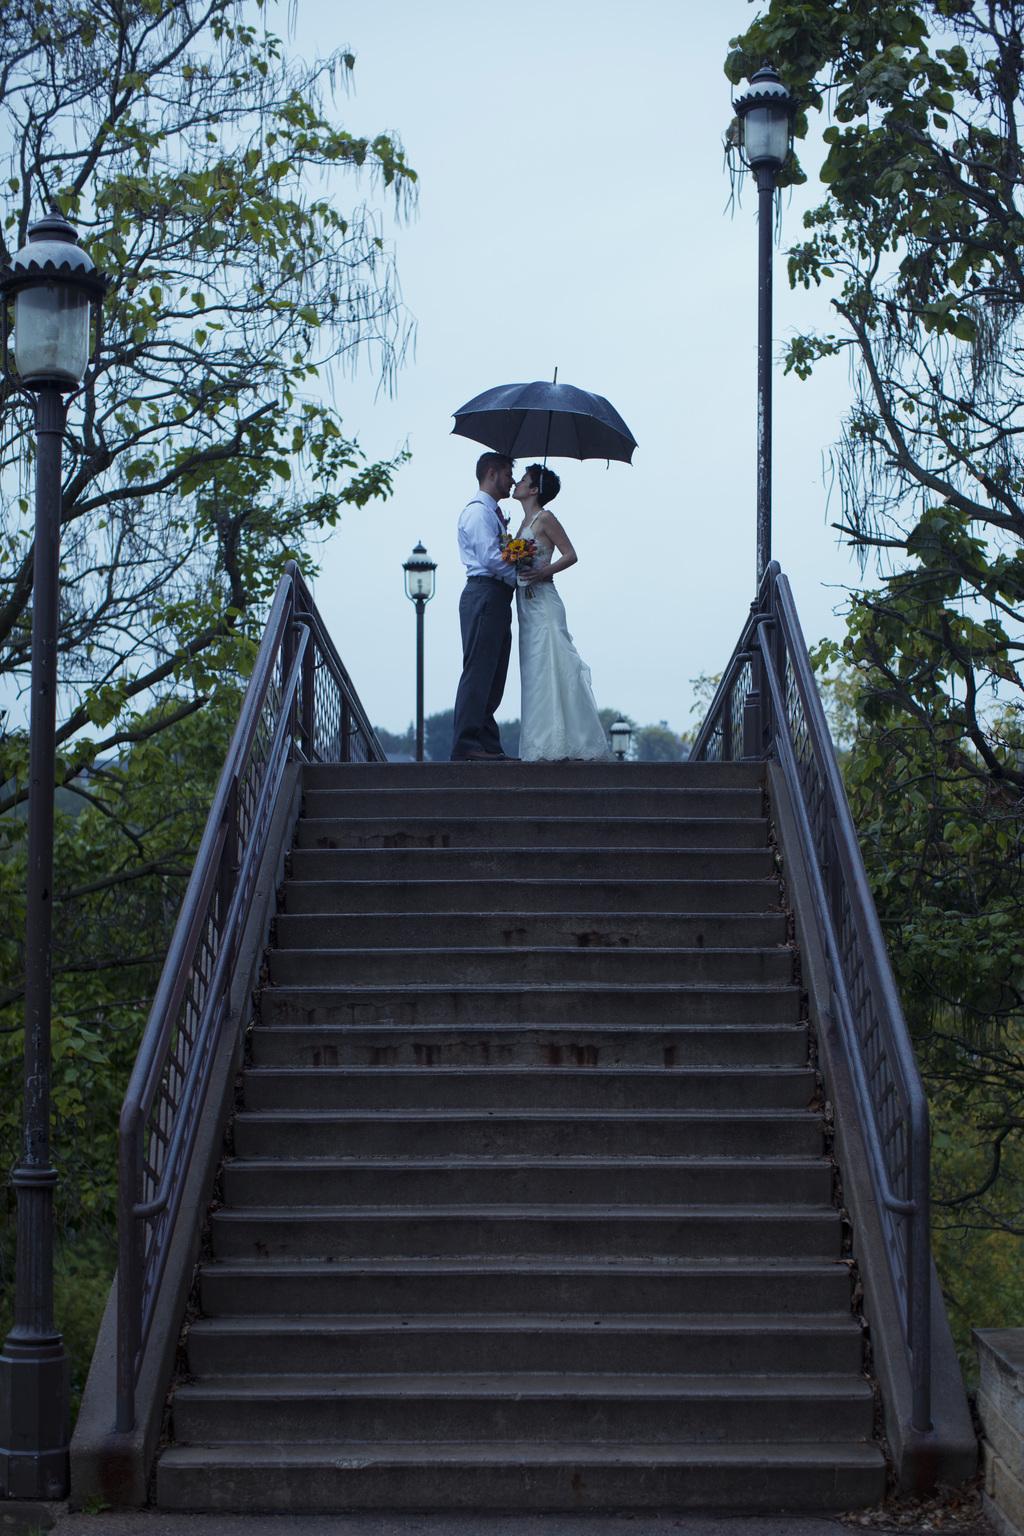 Peer_canvas_wedding_photography_rockford_galena_stairs_rain_bride_groom_stairs.full